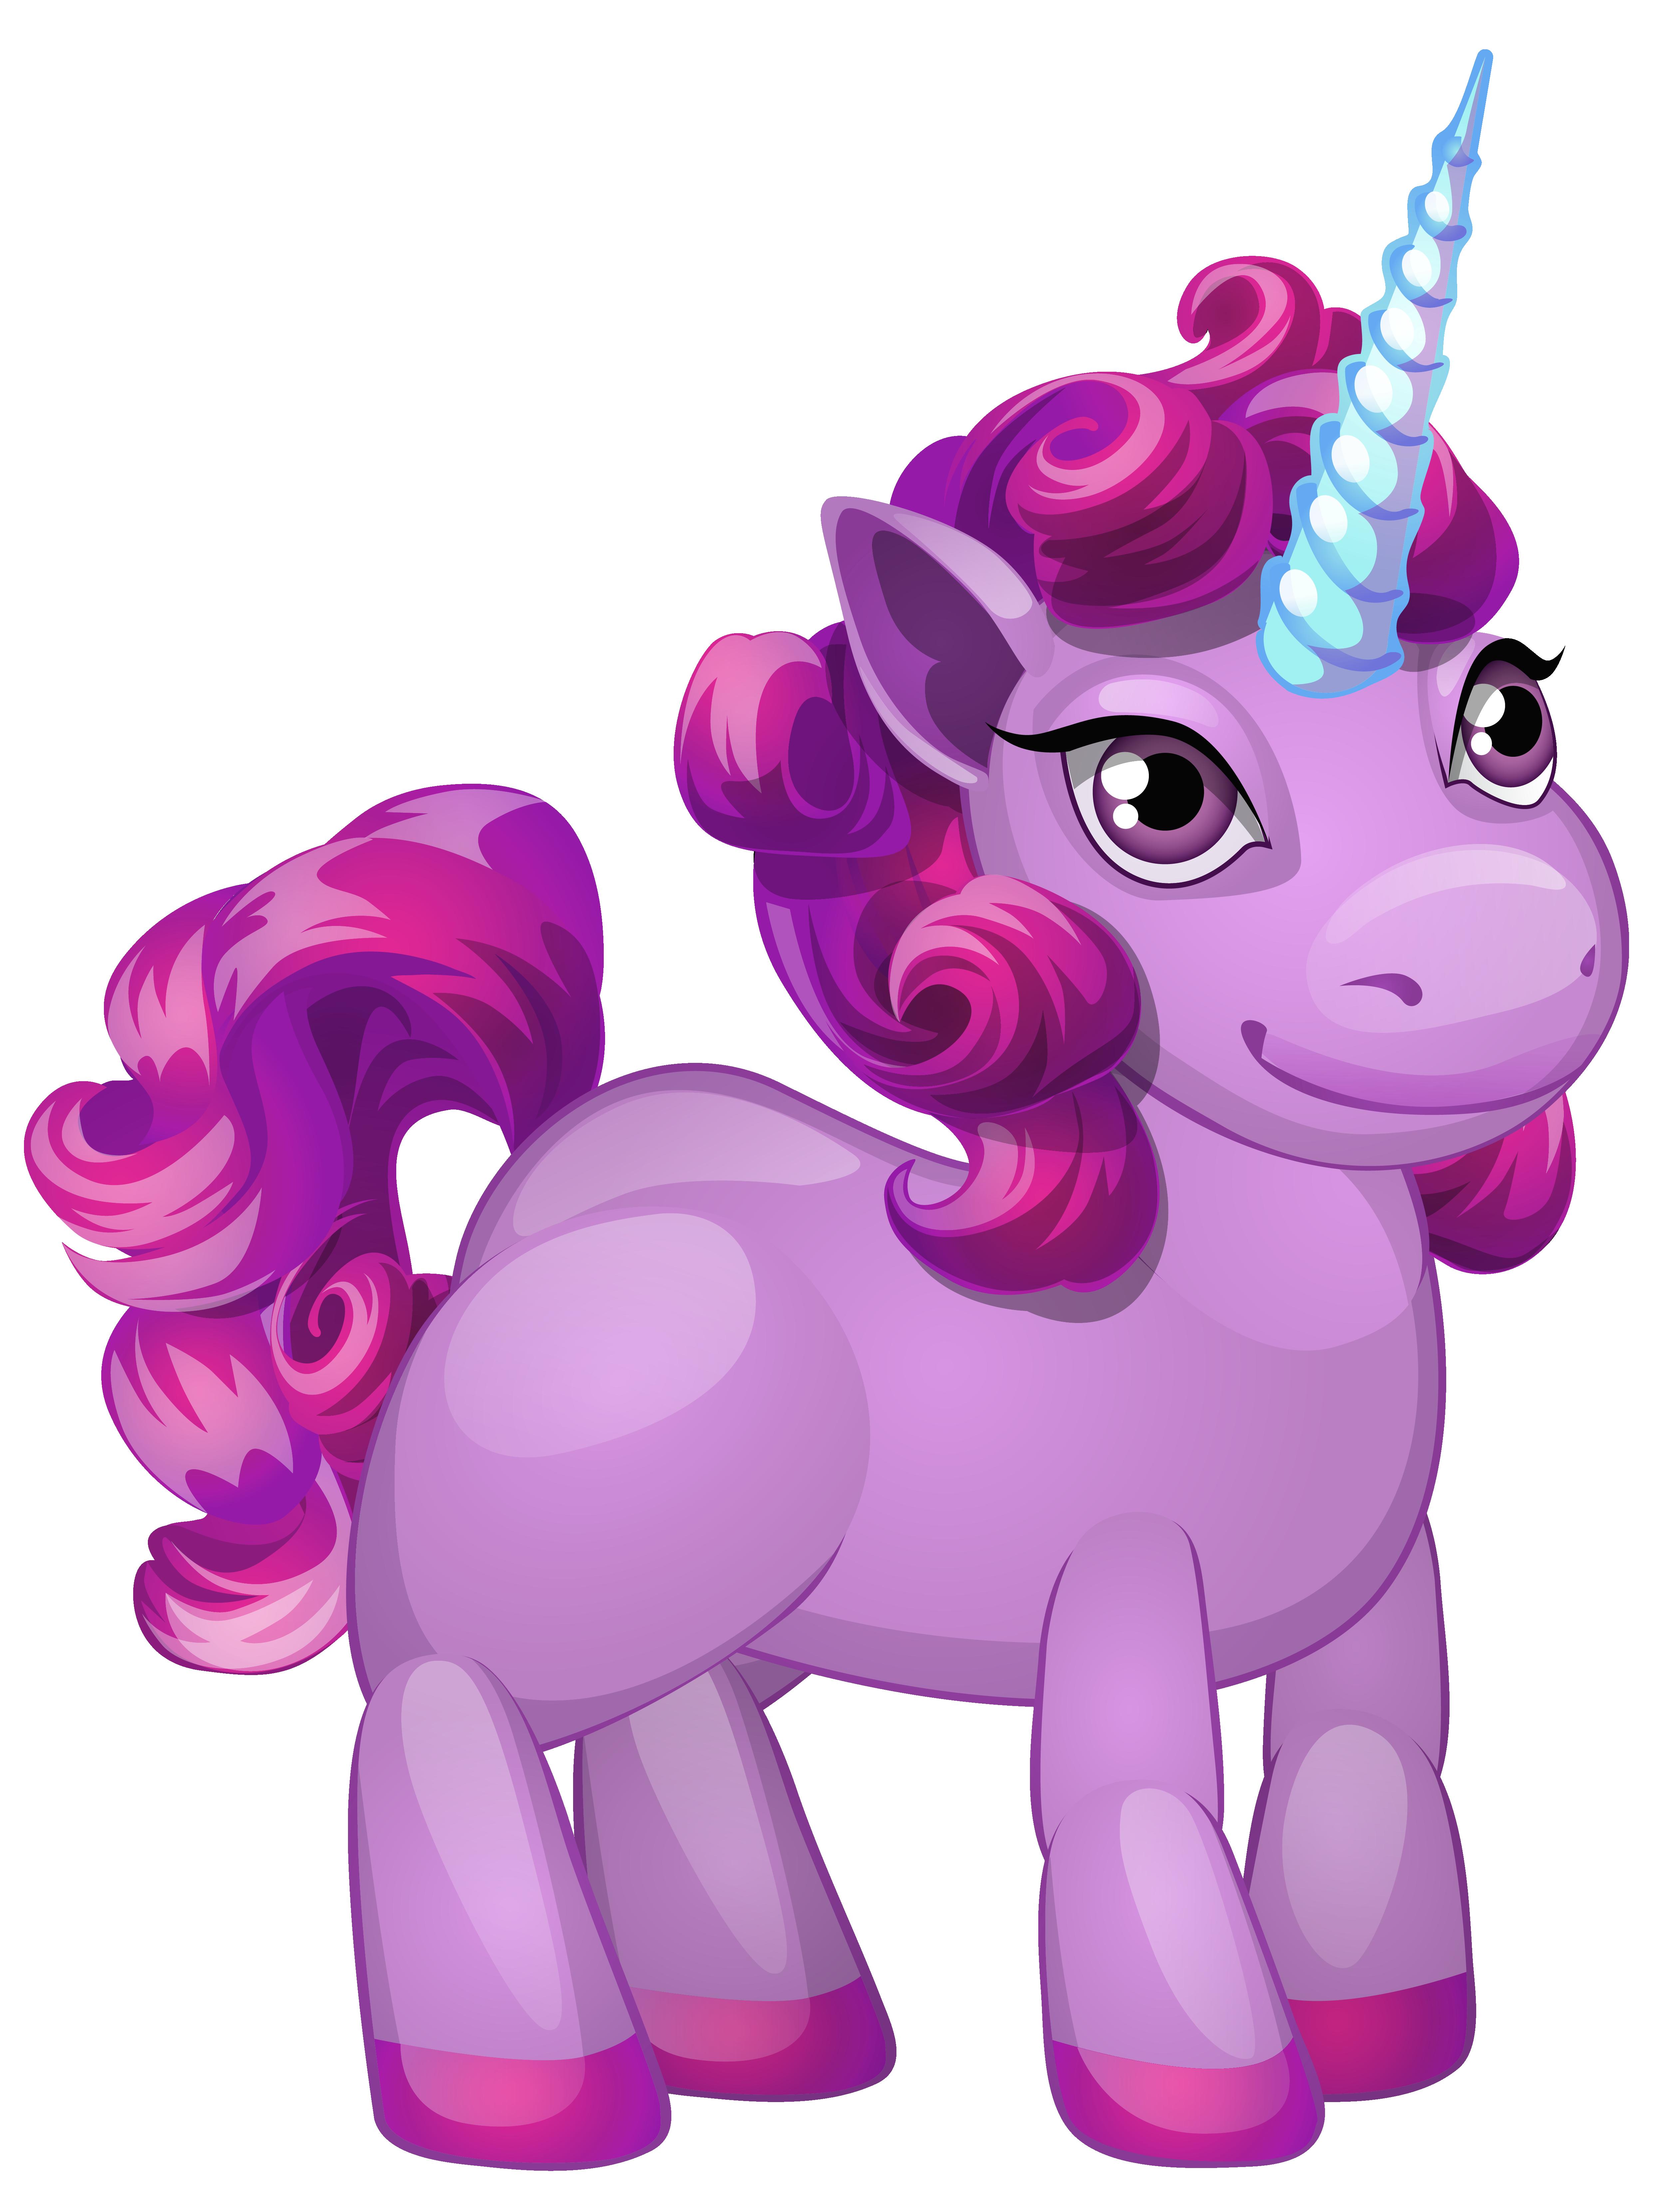 Cute Purple Pony PNG Clip Art Image.